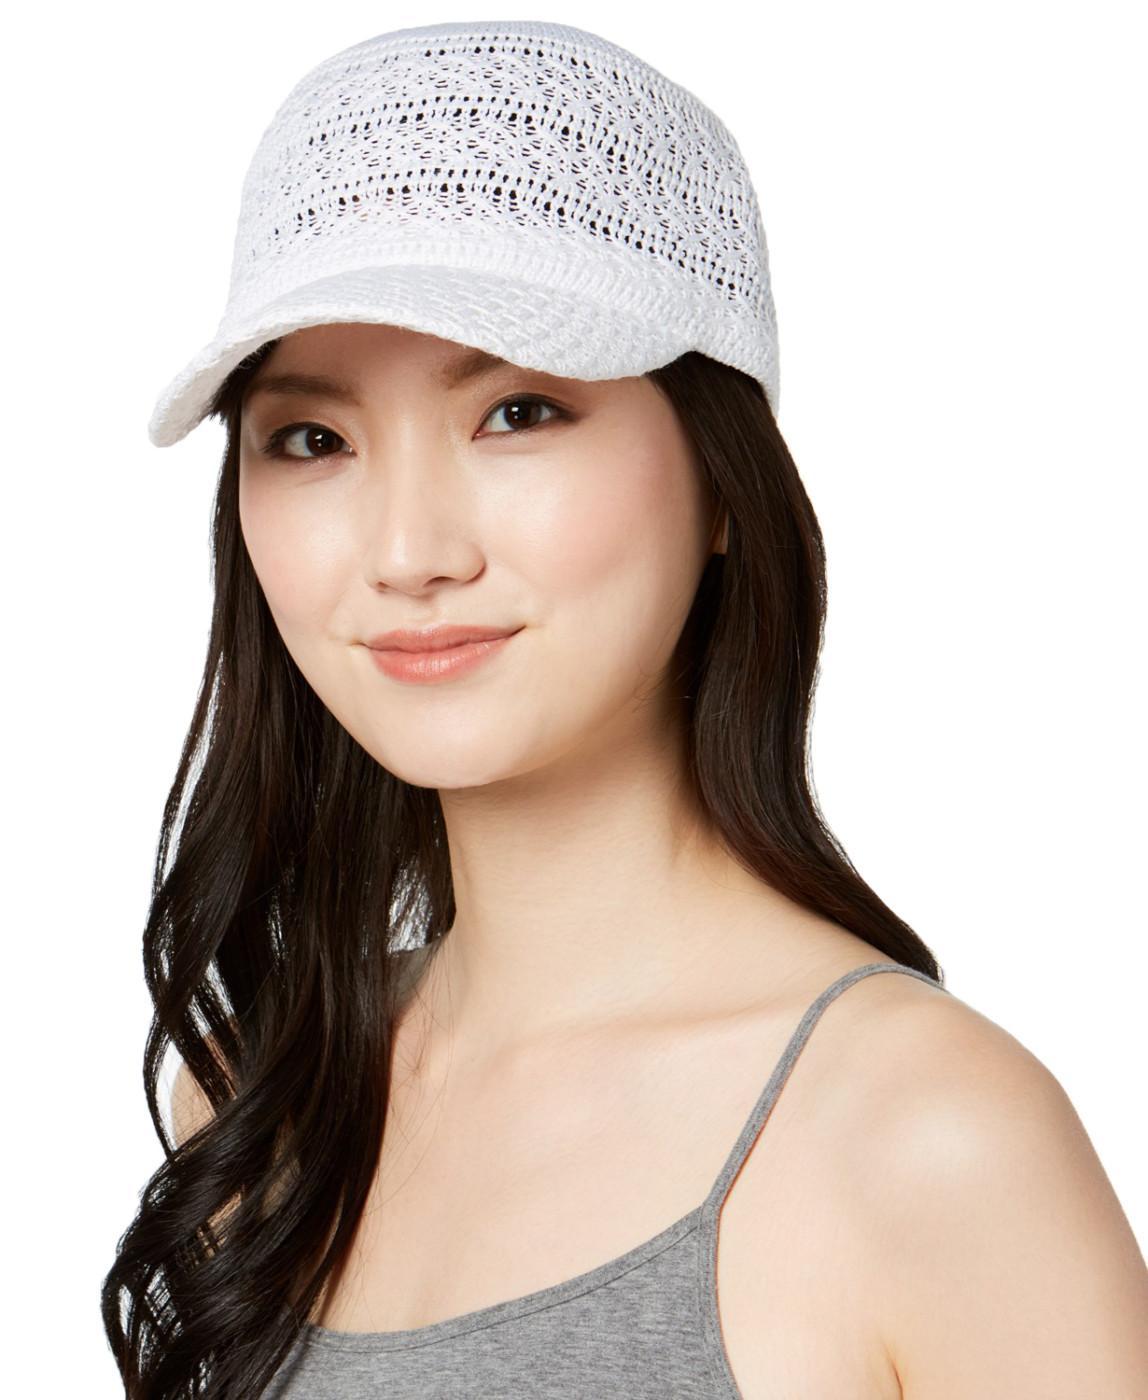 bc0397906 INC International Concepts Women's White Crochet Packable Baseball Cap Hat